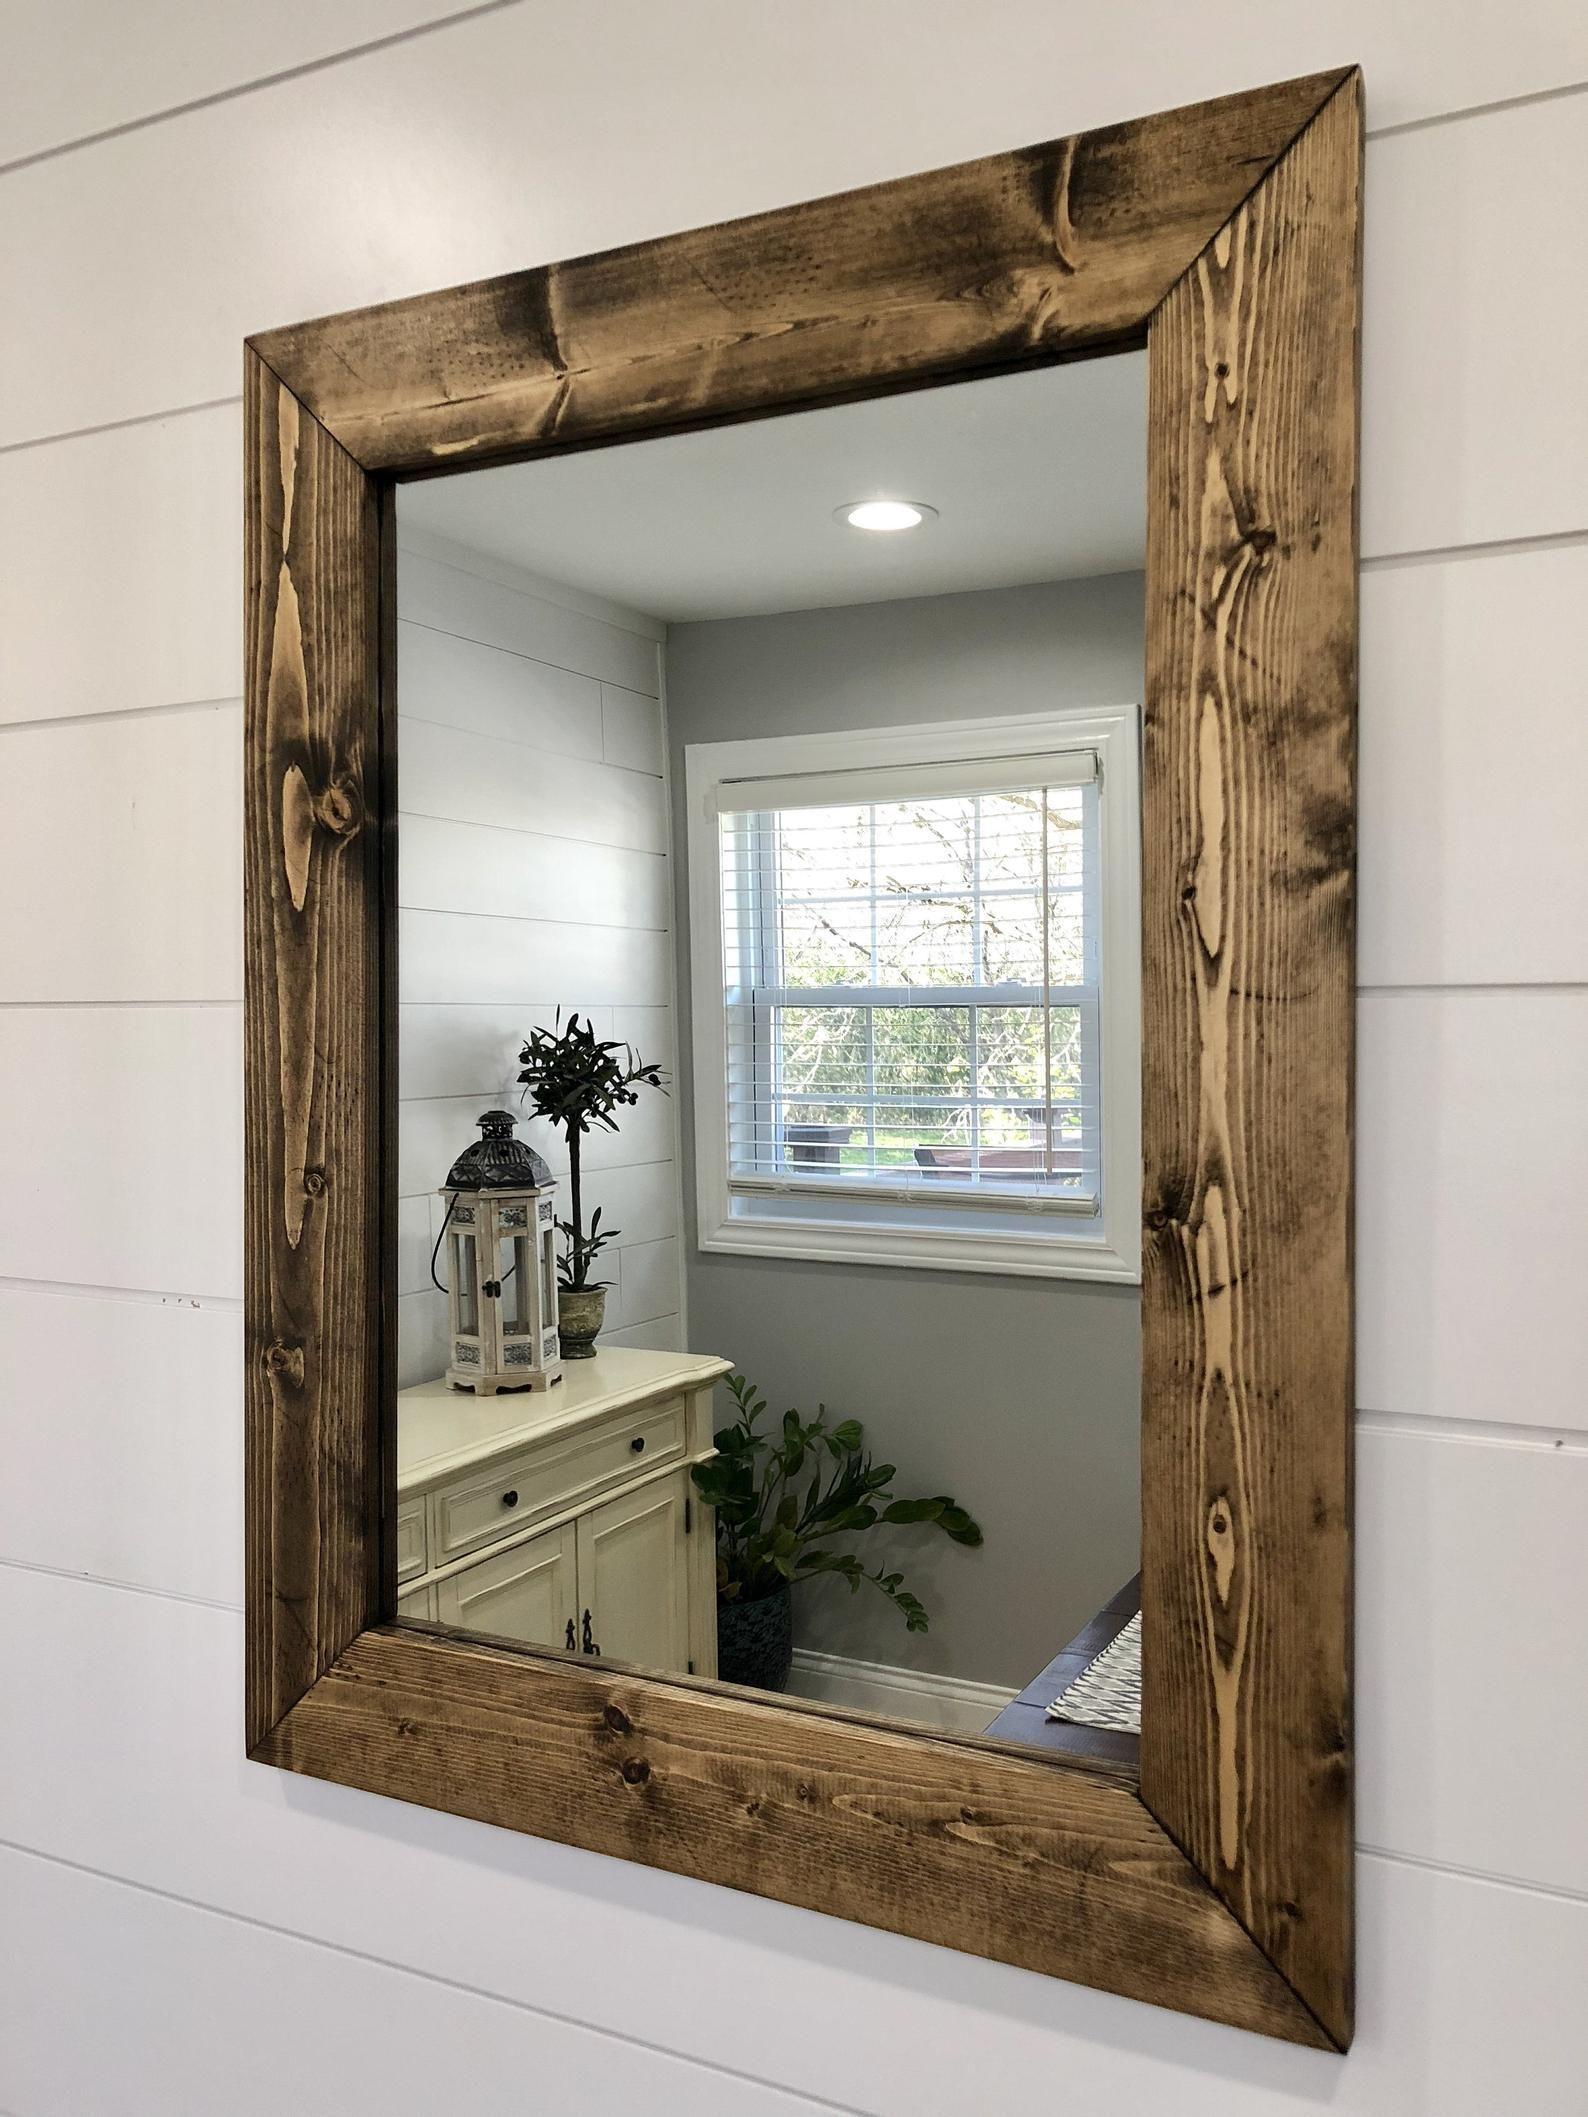 Dark Walnut Mirror Wood Frame Mirror Handmade Rustic Wood Etsy Wood Framed Mirror Wood Mirror Rustic Wood Frame